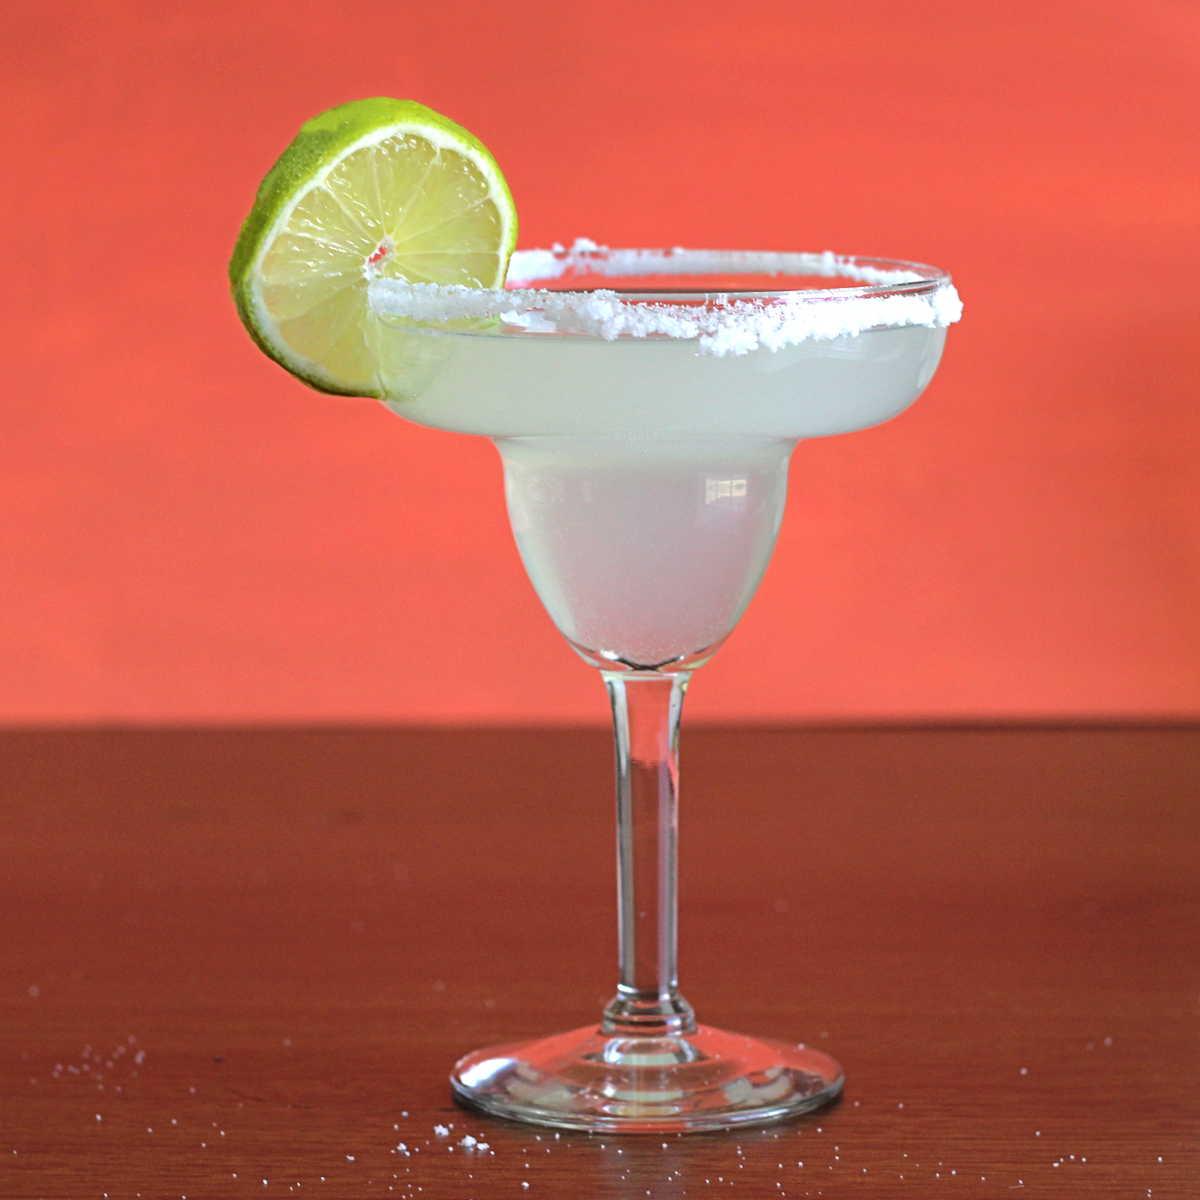 Margarita Recipe: The Classic Tequila, Orange And Lime